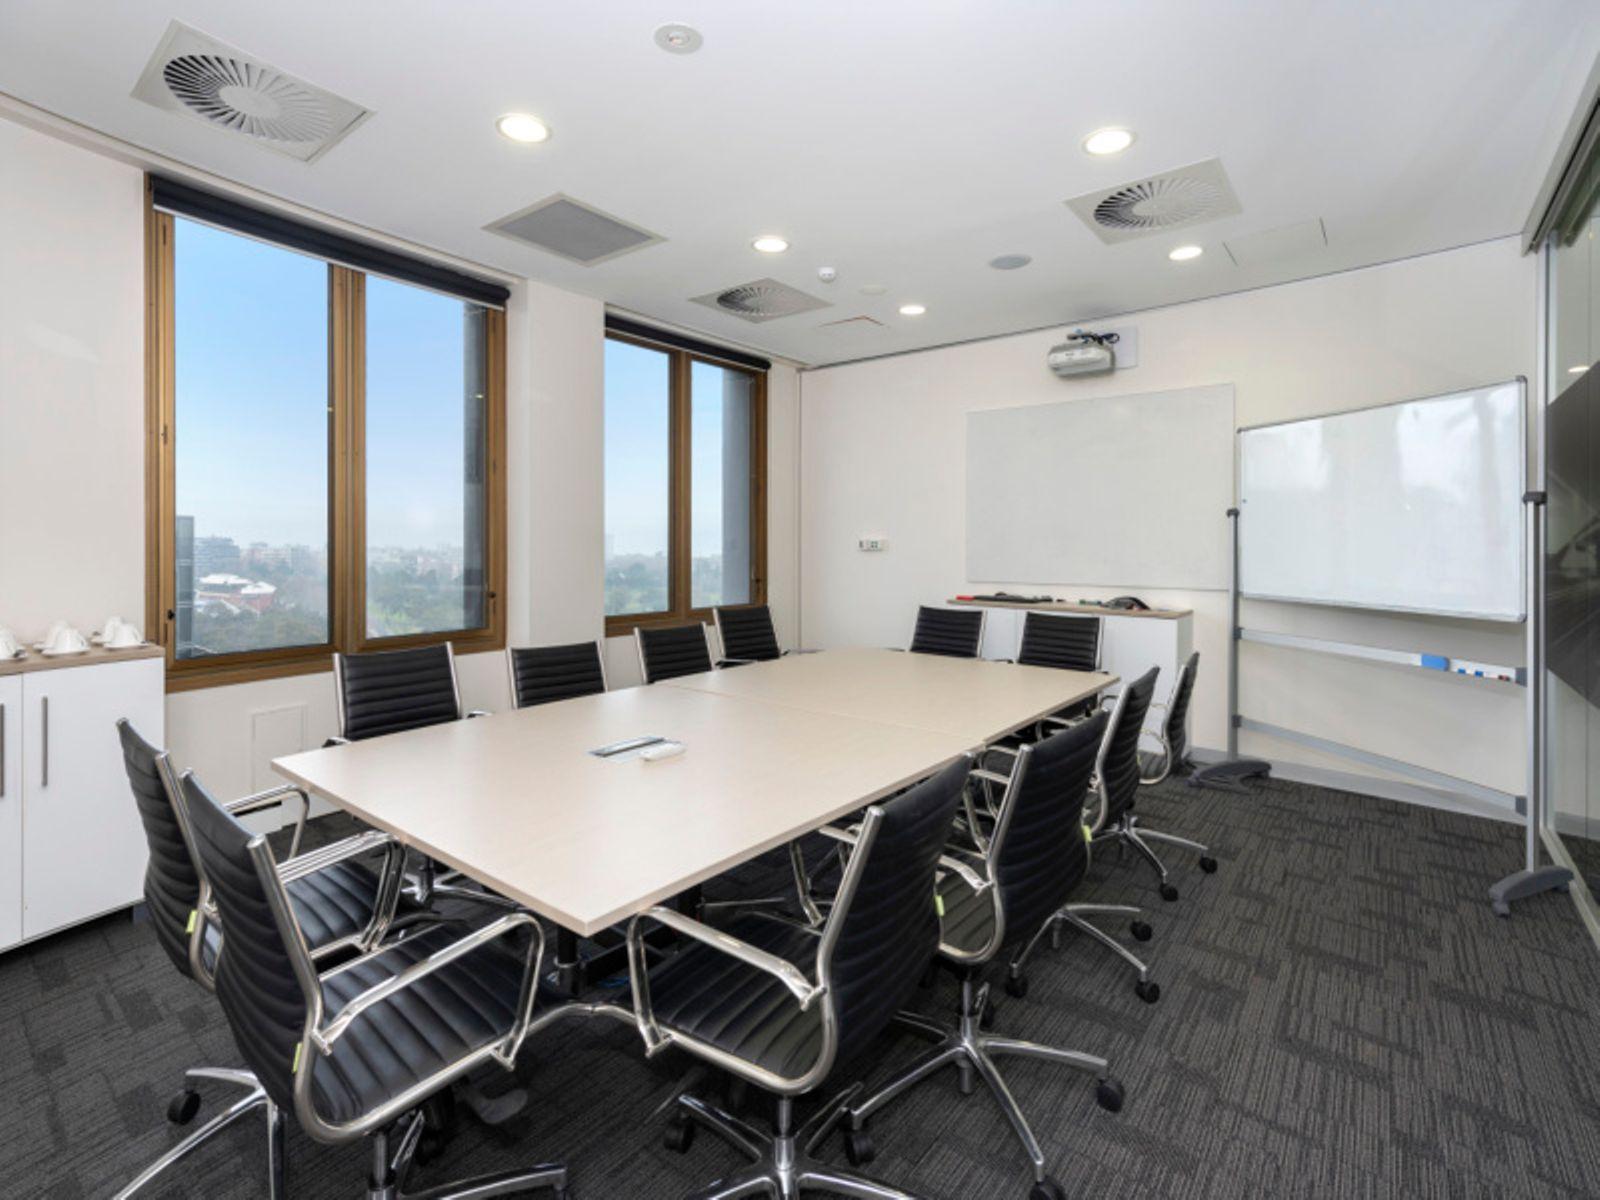 71 QR   Level 10 Board room DxO